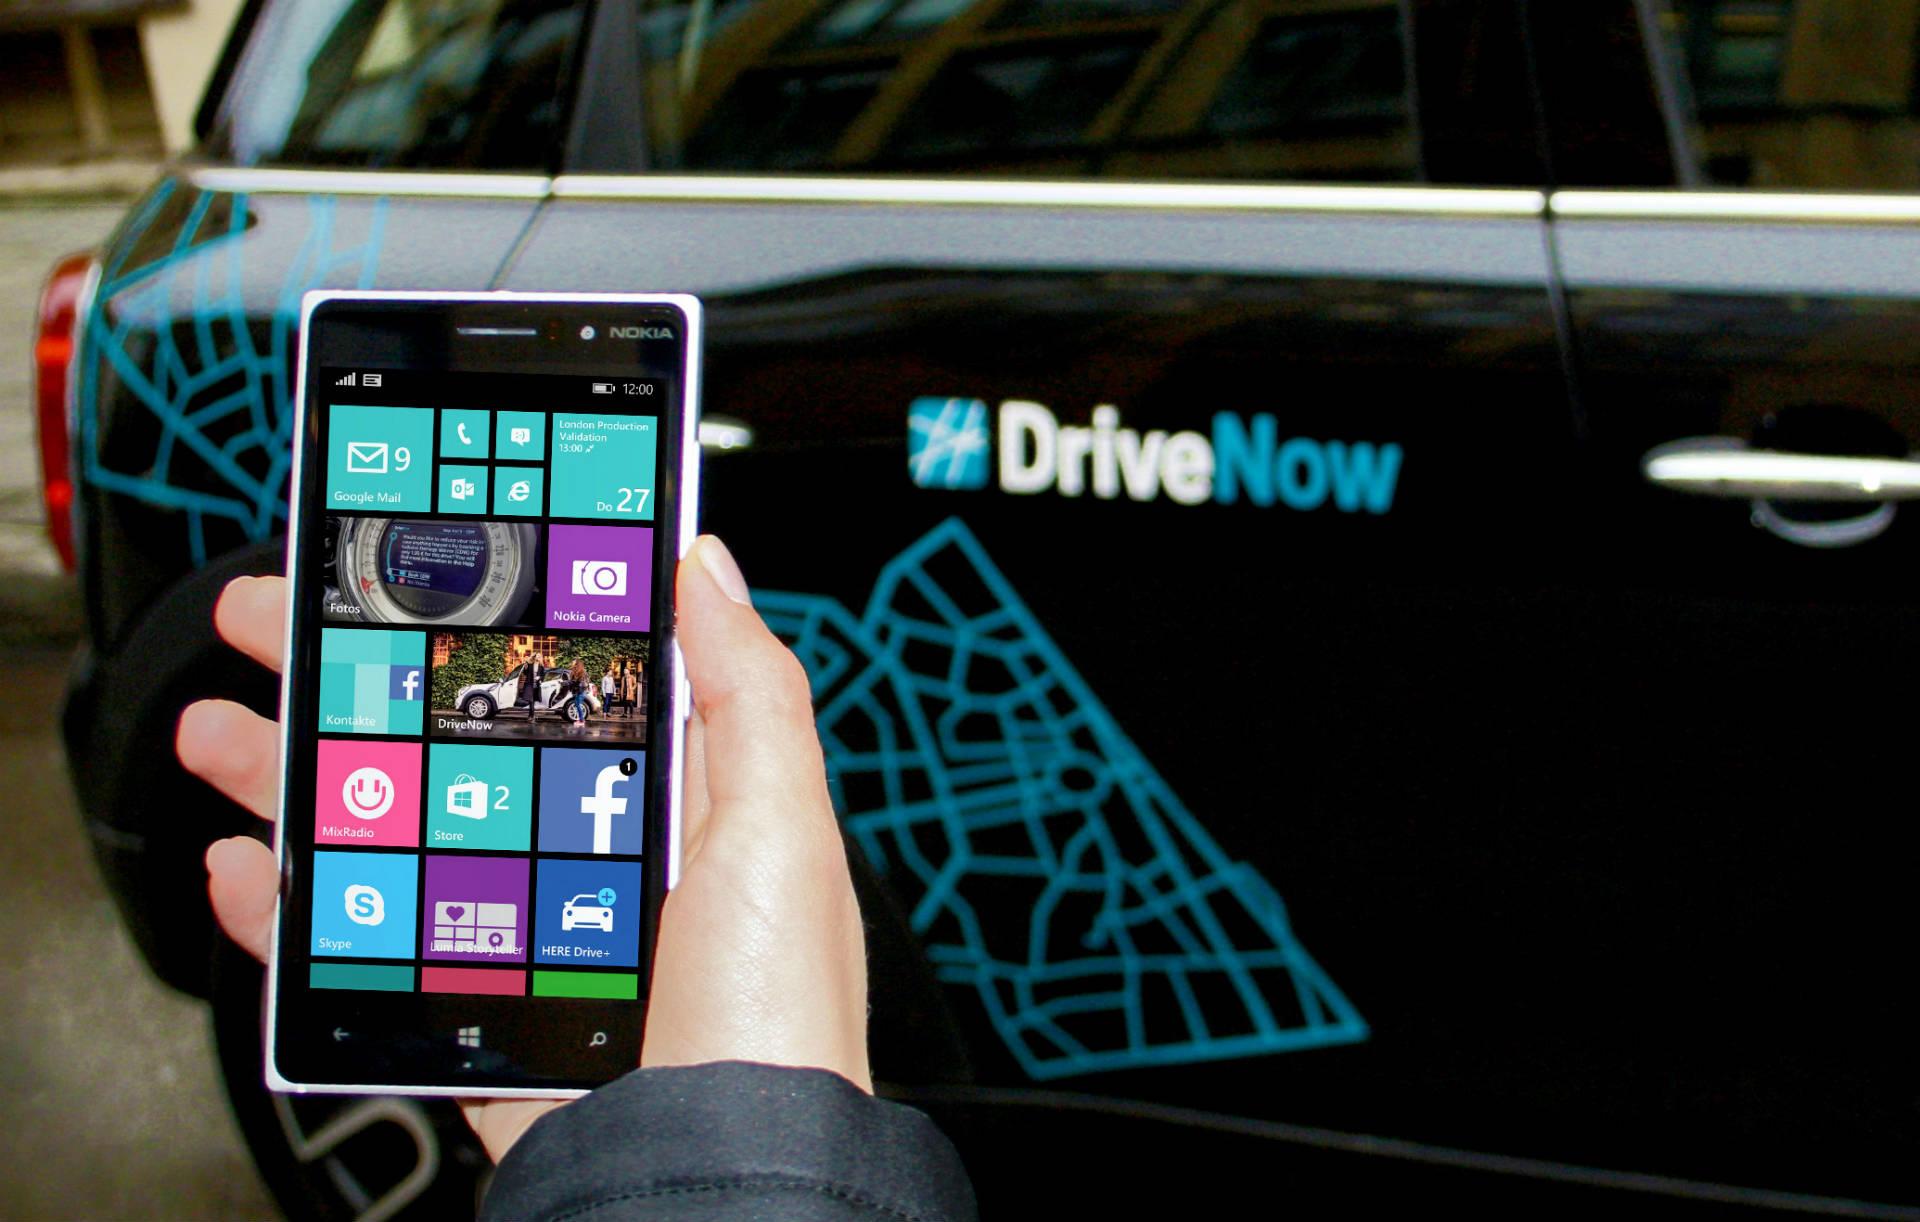 Windows Phone DriveNow App